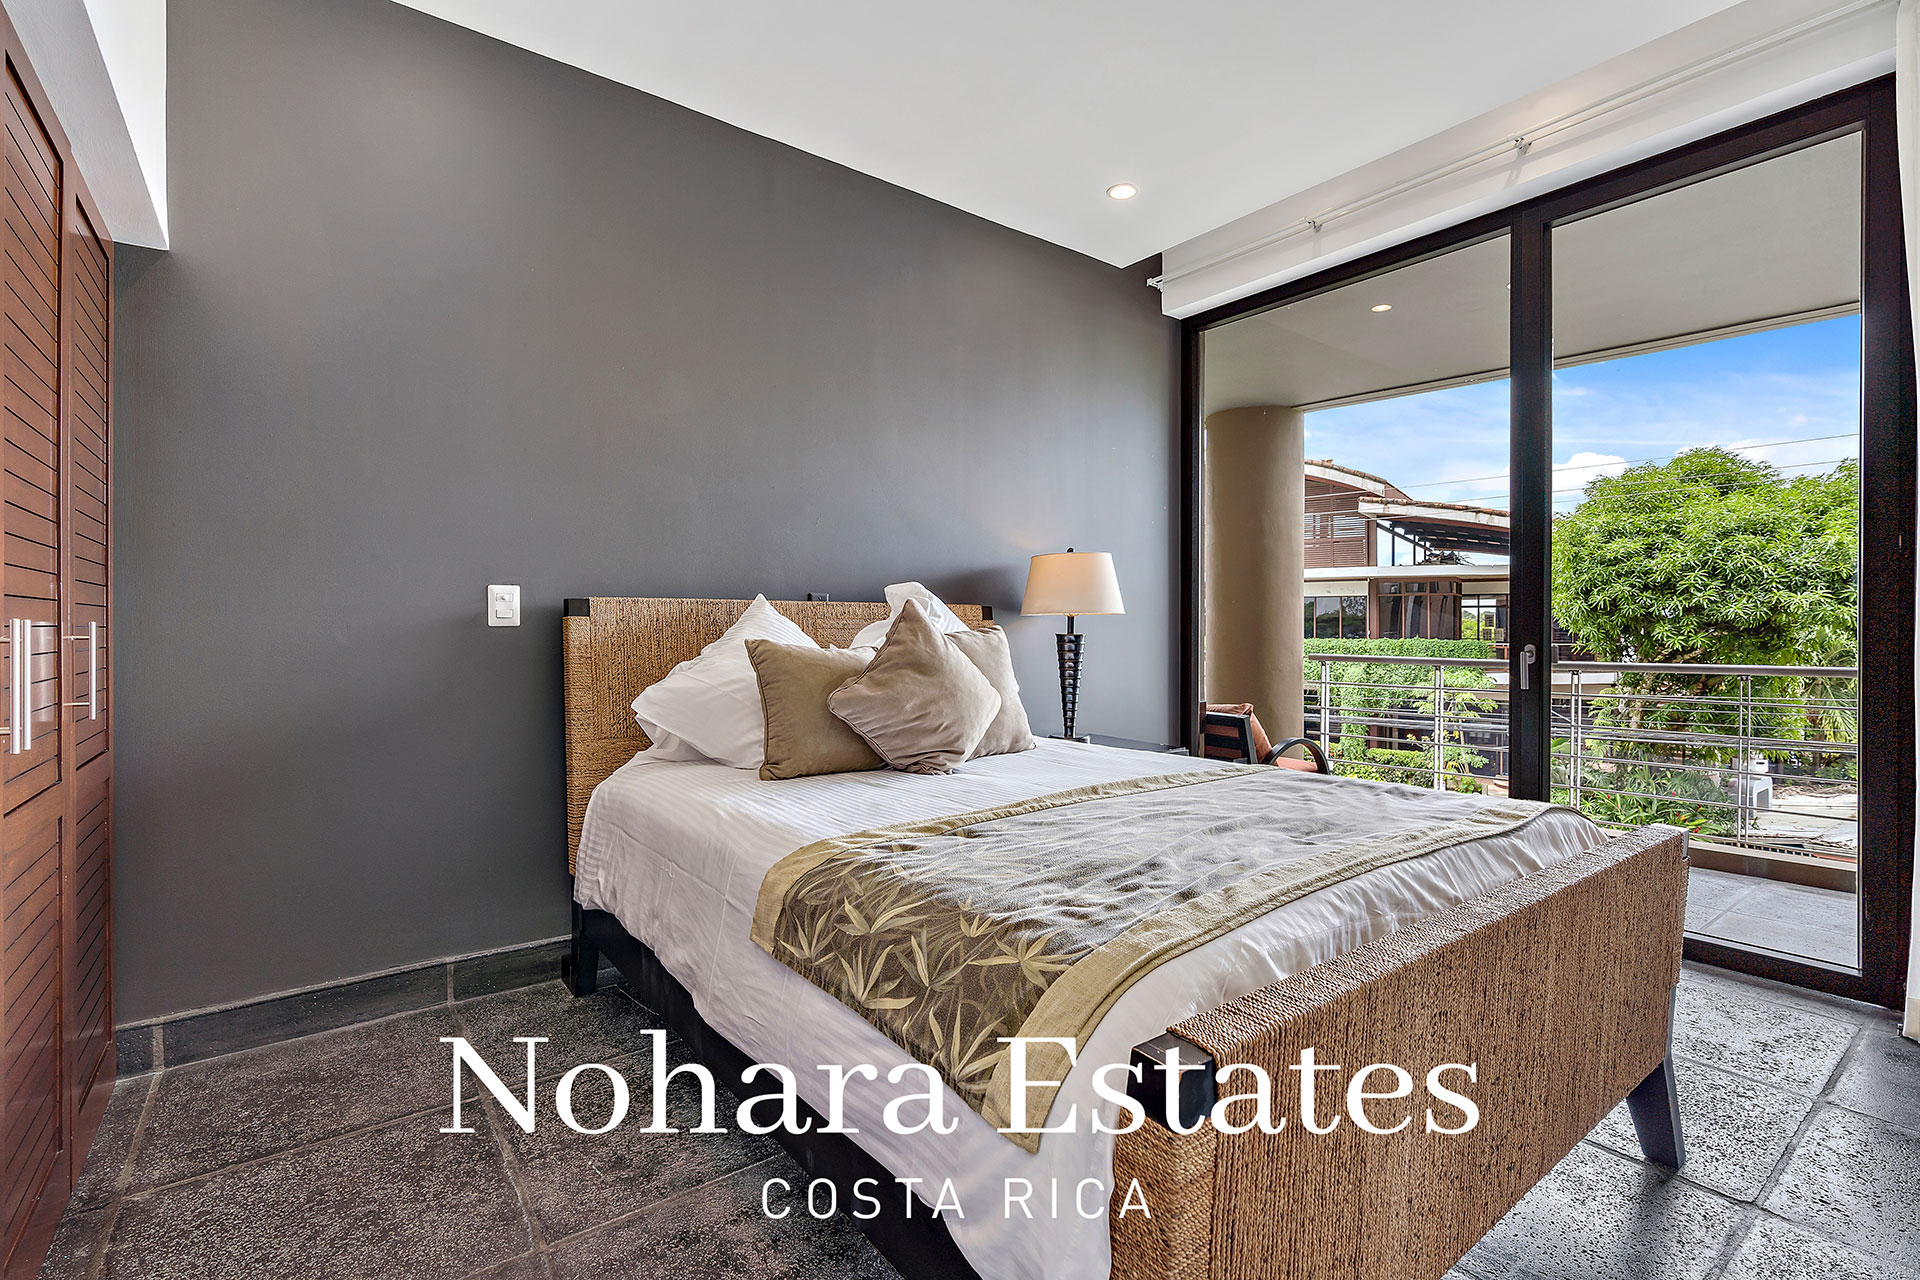 Nohara Estates Costa Rica 125 Apartment Quepos Los Altos 16